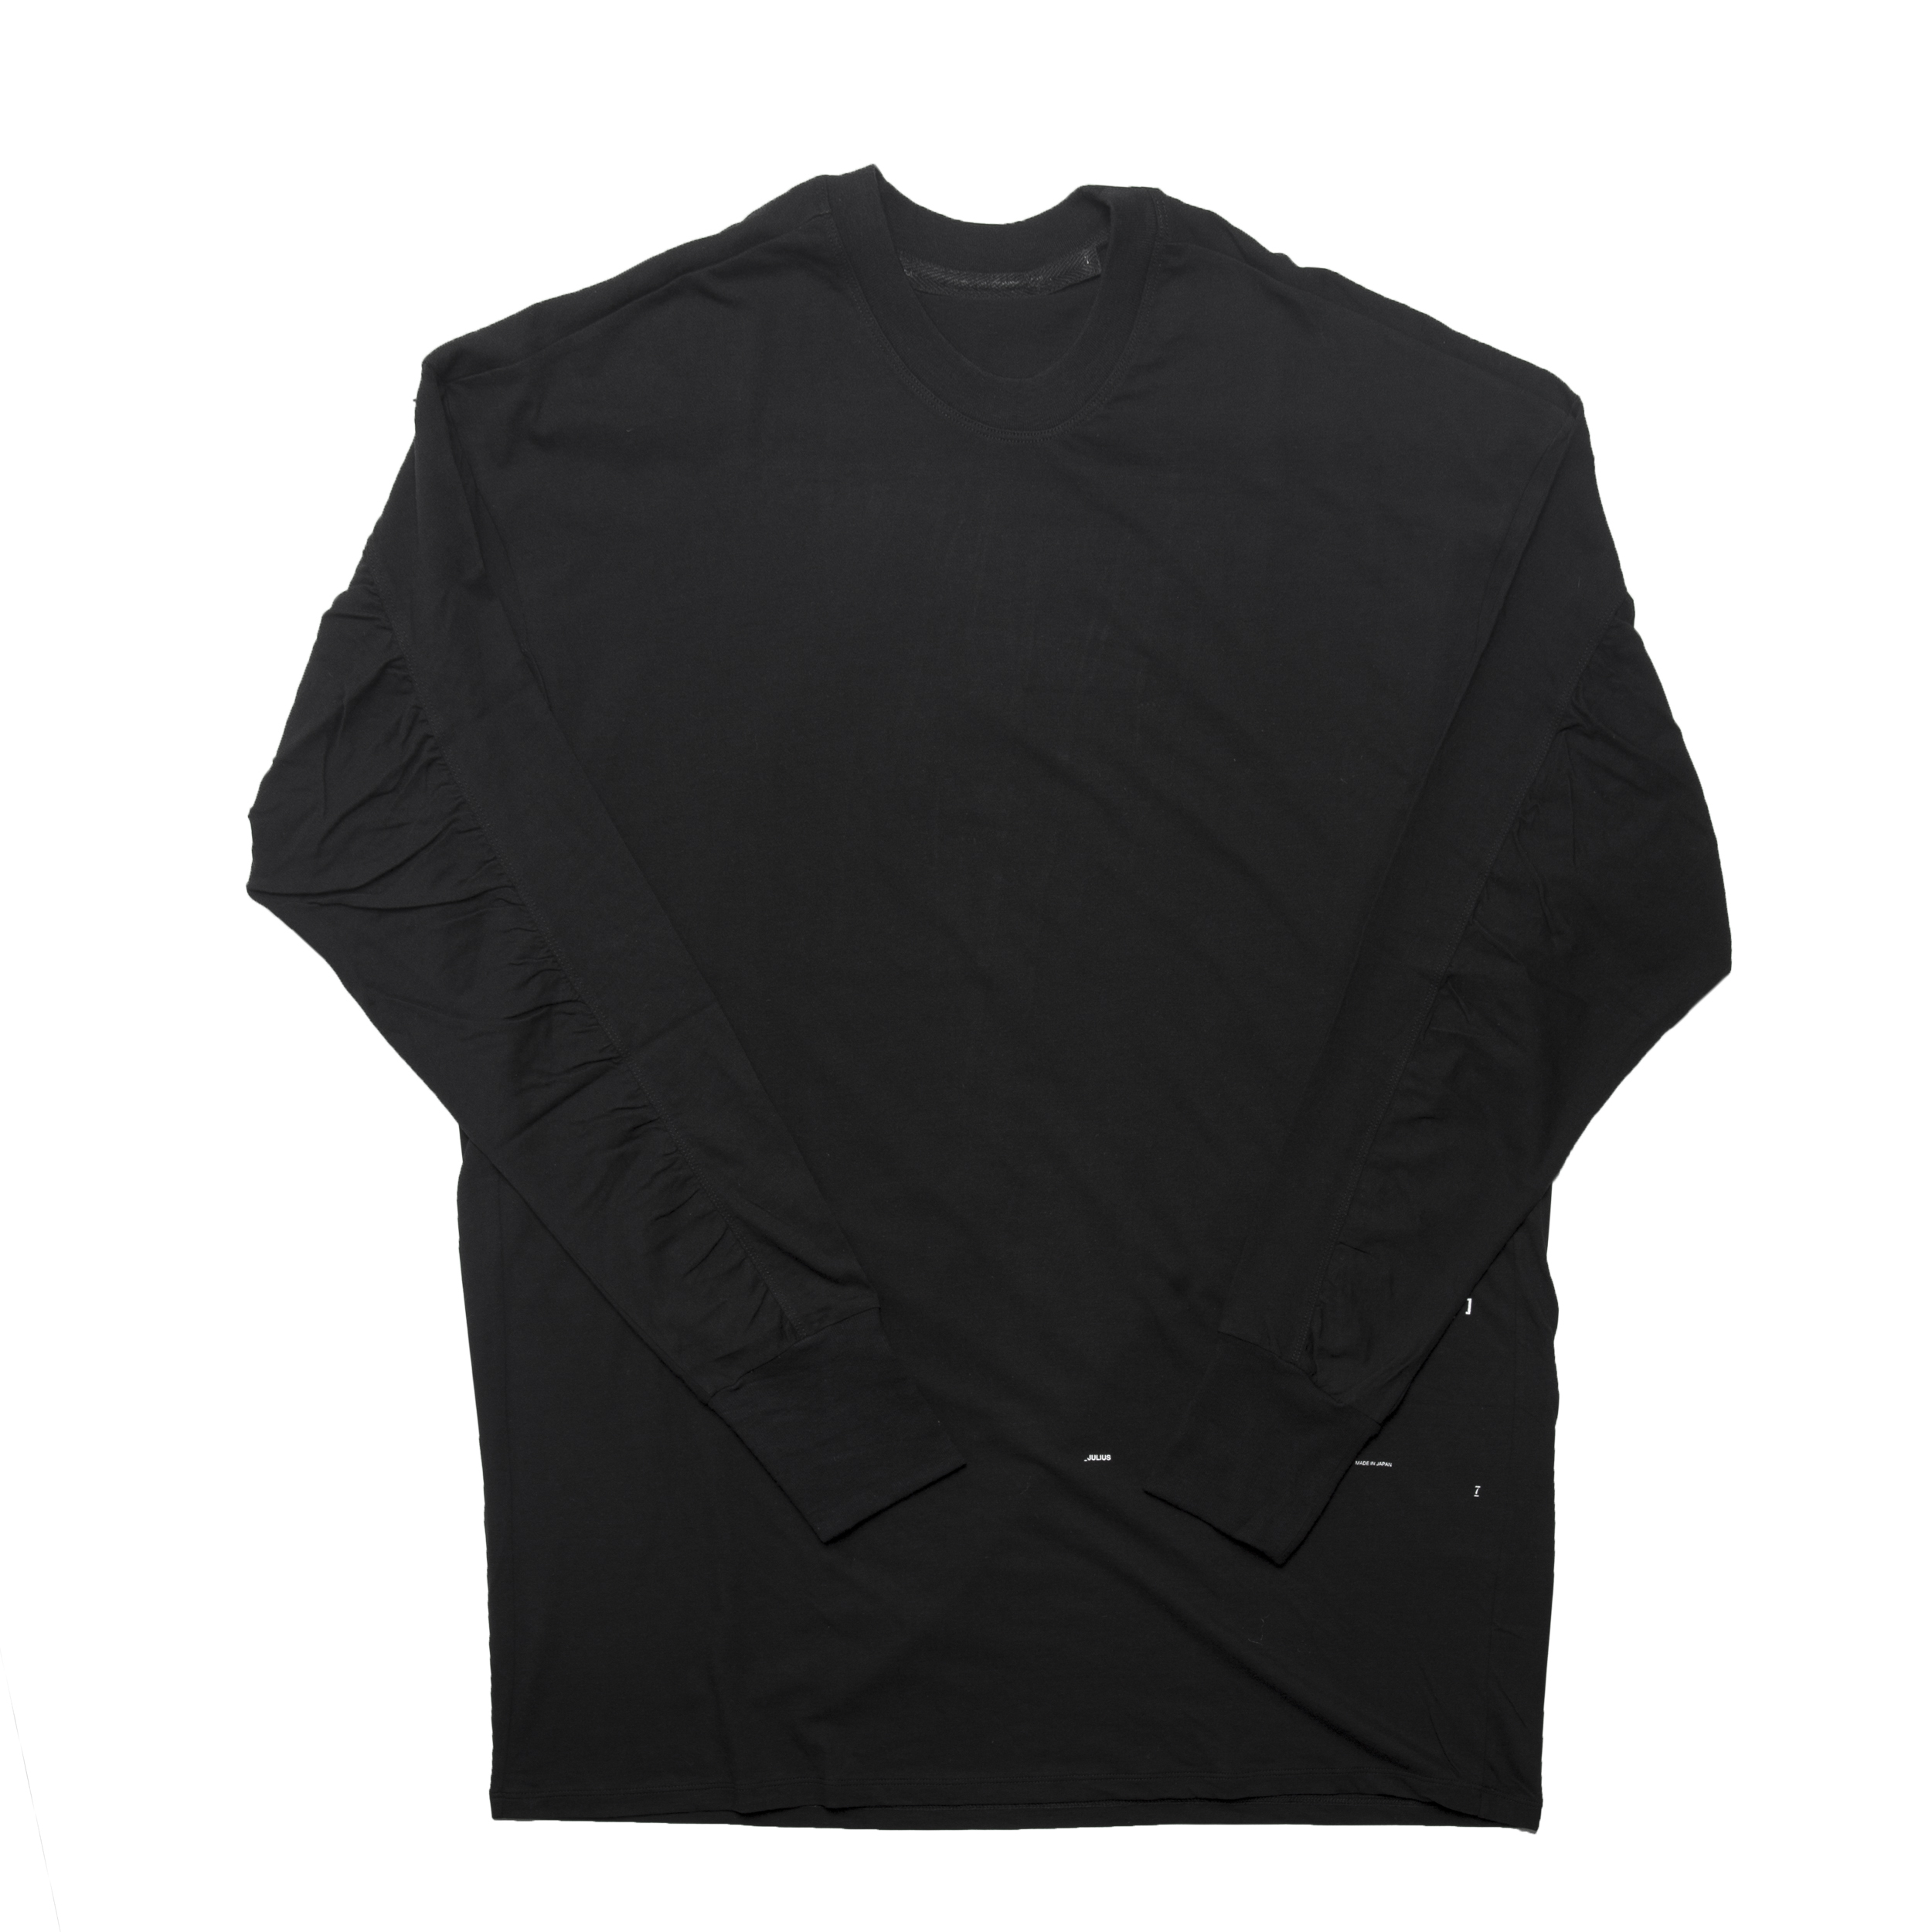 677CPM17-BLACK / ギャザーシームドロングスリーヴシャツ